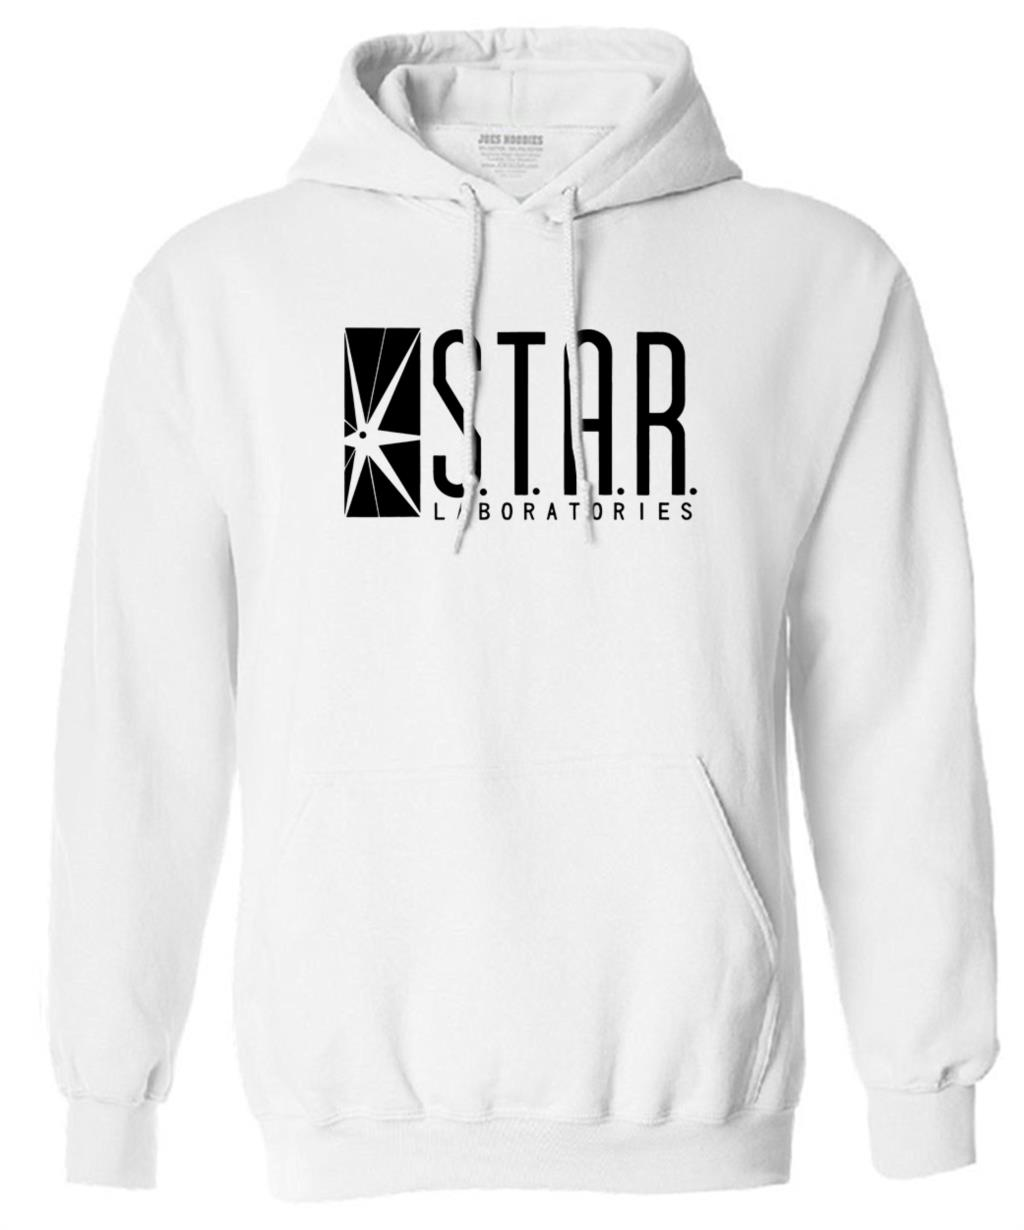 autumn brand hoodies superman series men hoody STAR S.T.A.R.labs jumper the flash gotham city comic books black sweatshirt 10